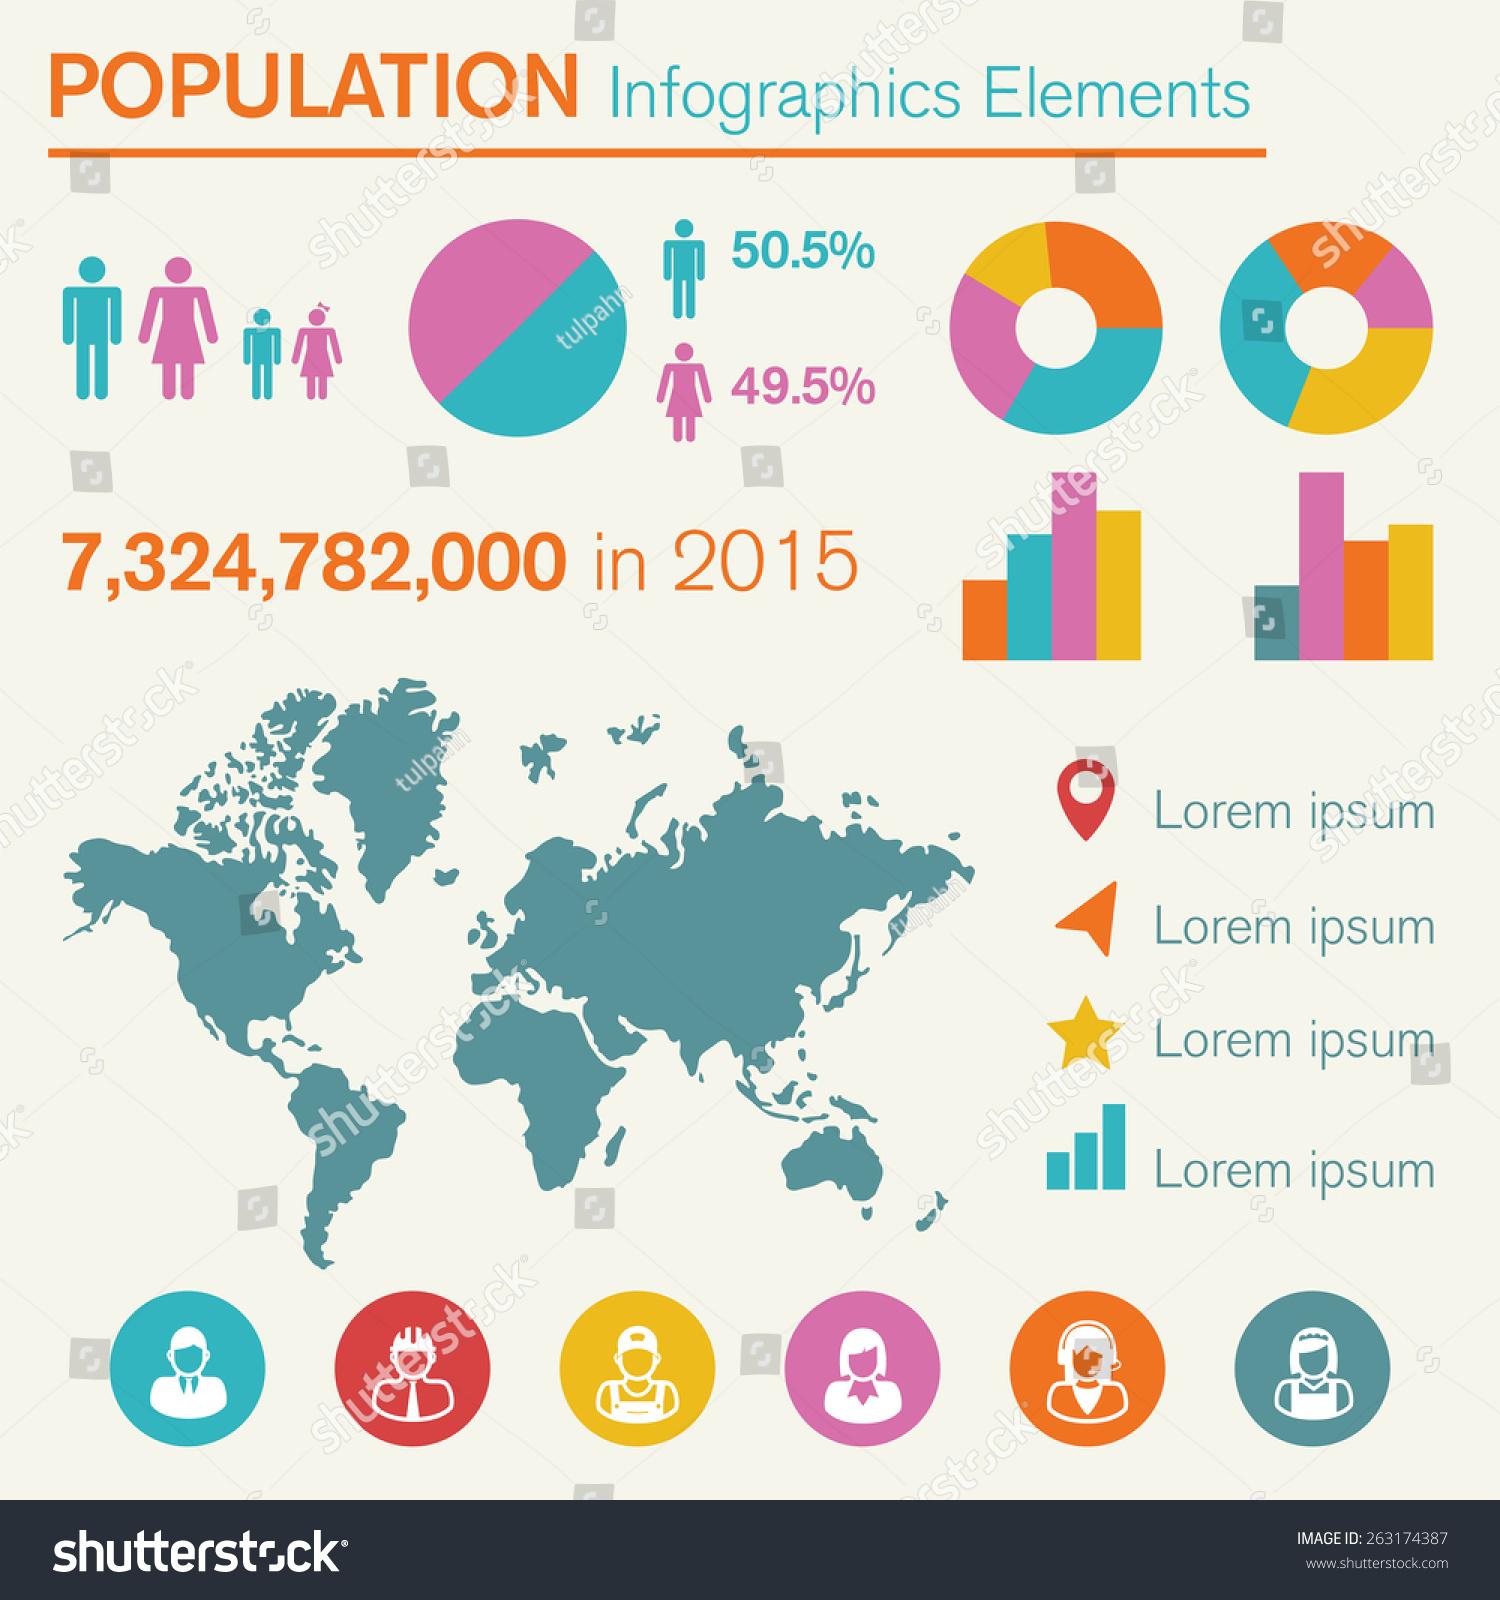 Population Infographics Elements Vector Symbols Stock Photo Photo